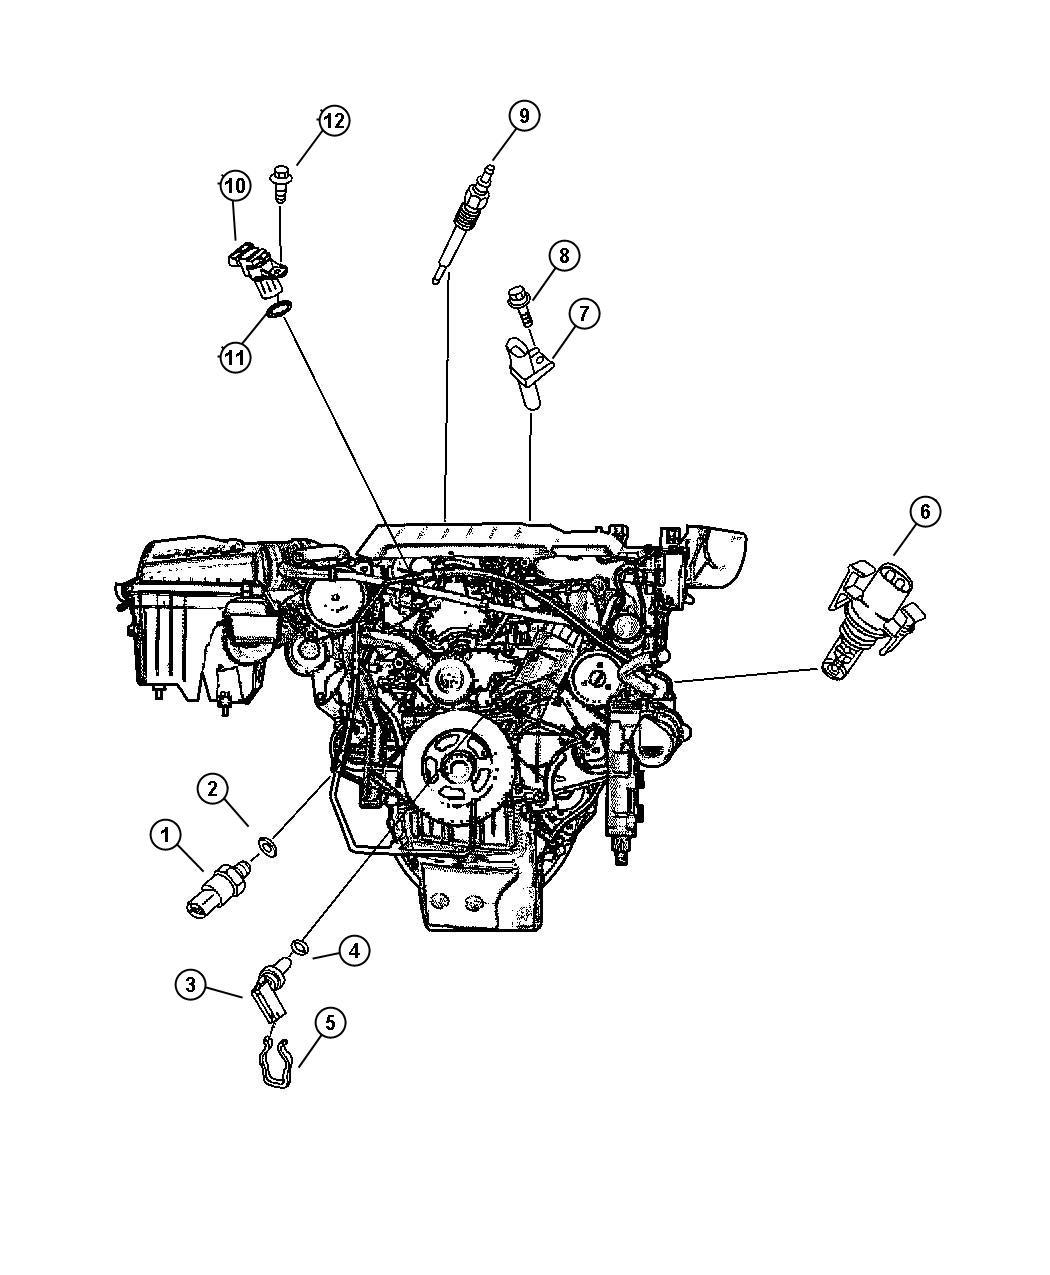 2005 Chrysler Crossfire Sending unit, sensor. Temperature